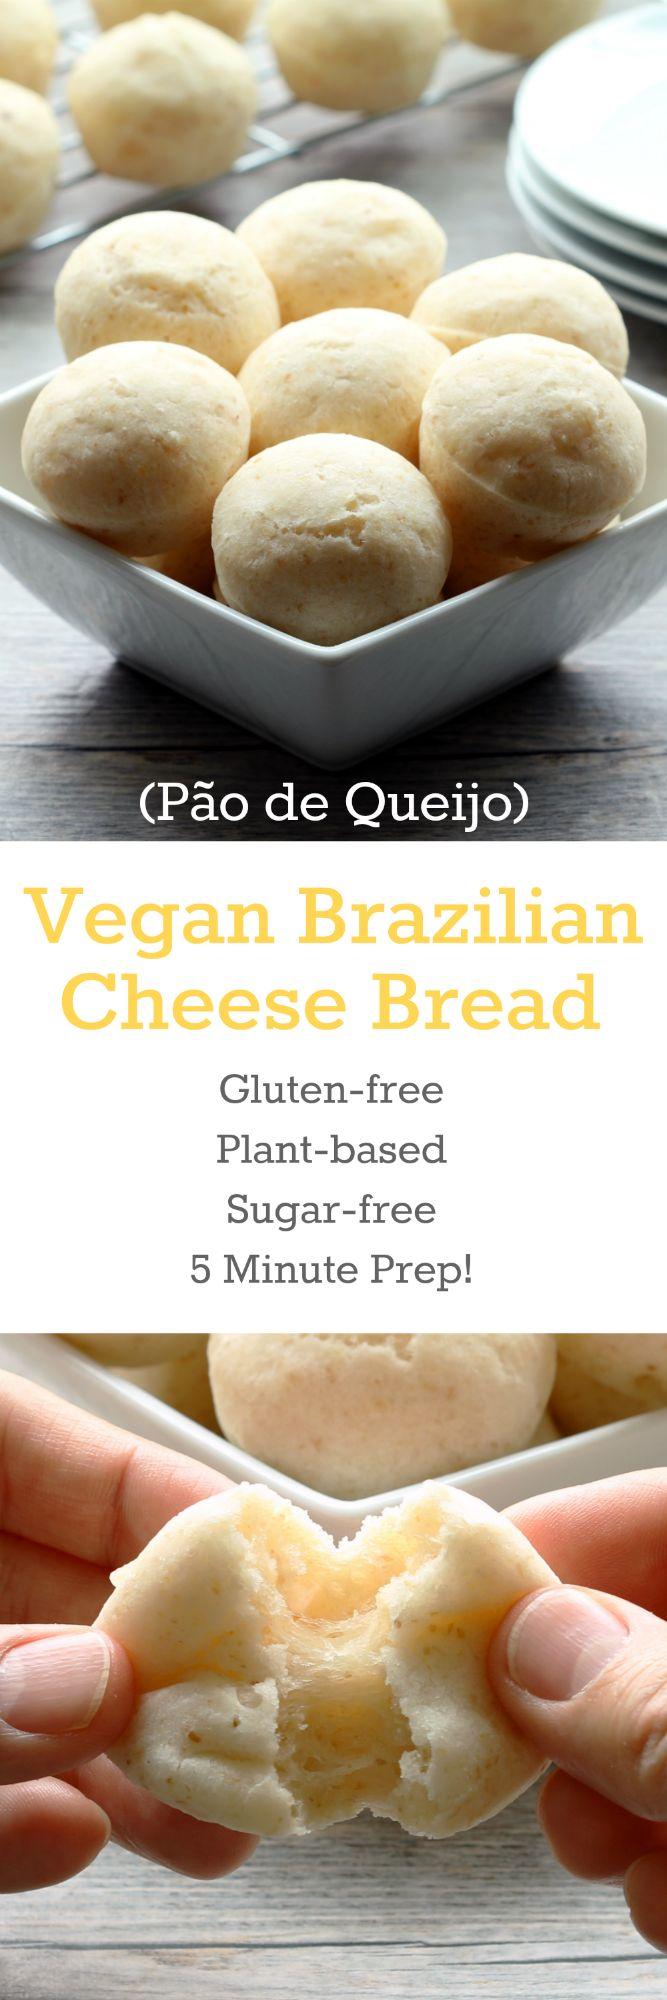 Vegan Brazilian Cheese Bread (Gluten-free, Plant-based, Sugar-free)